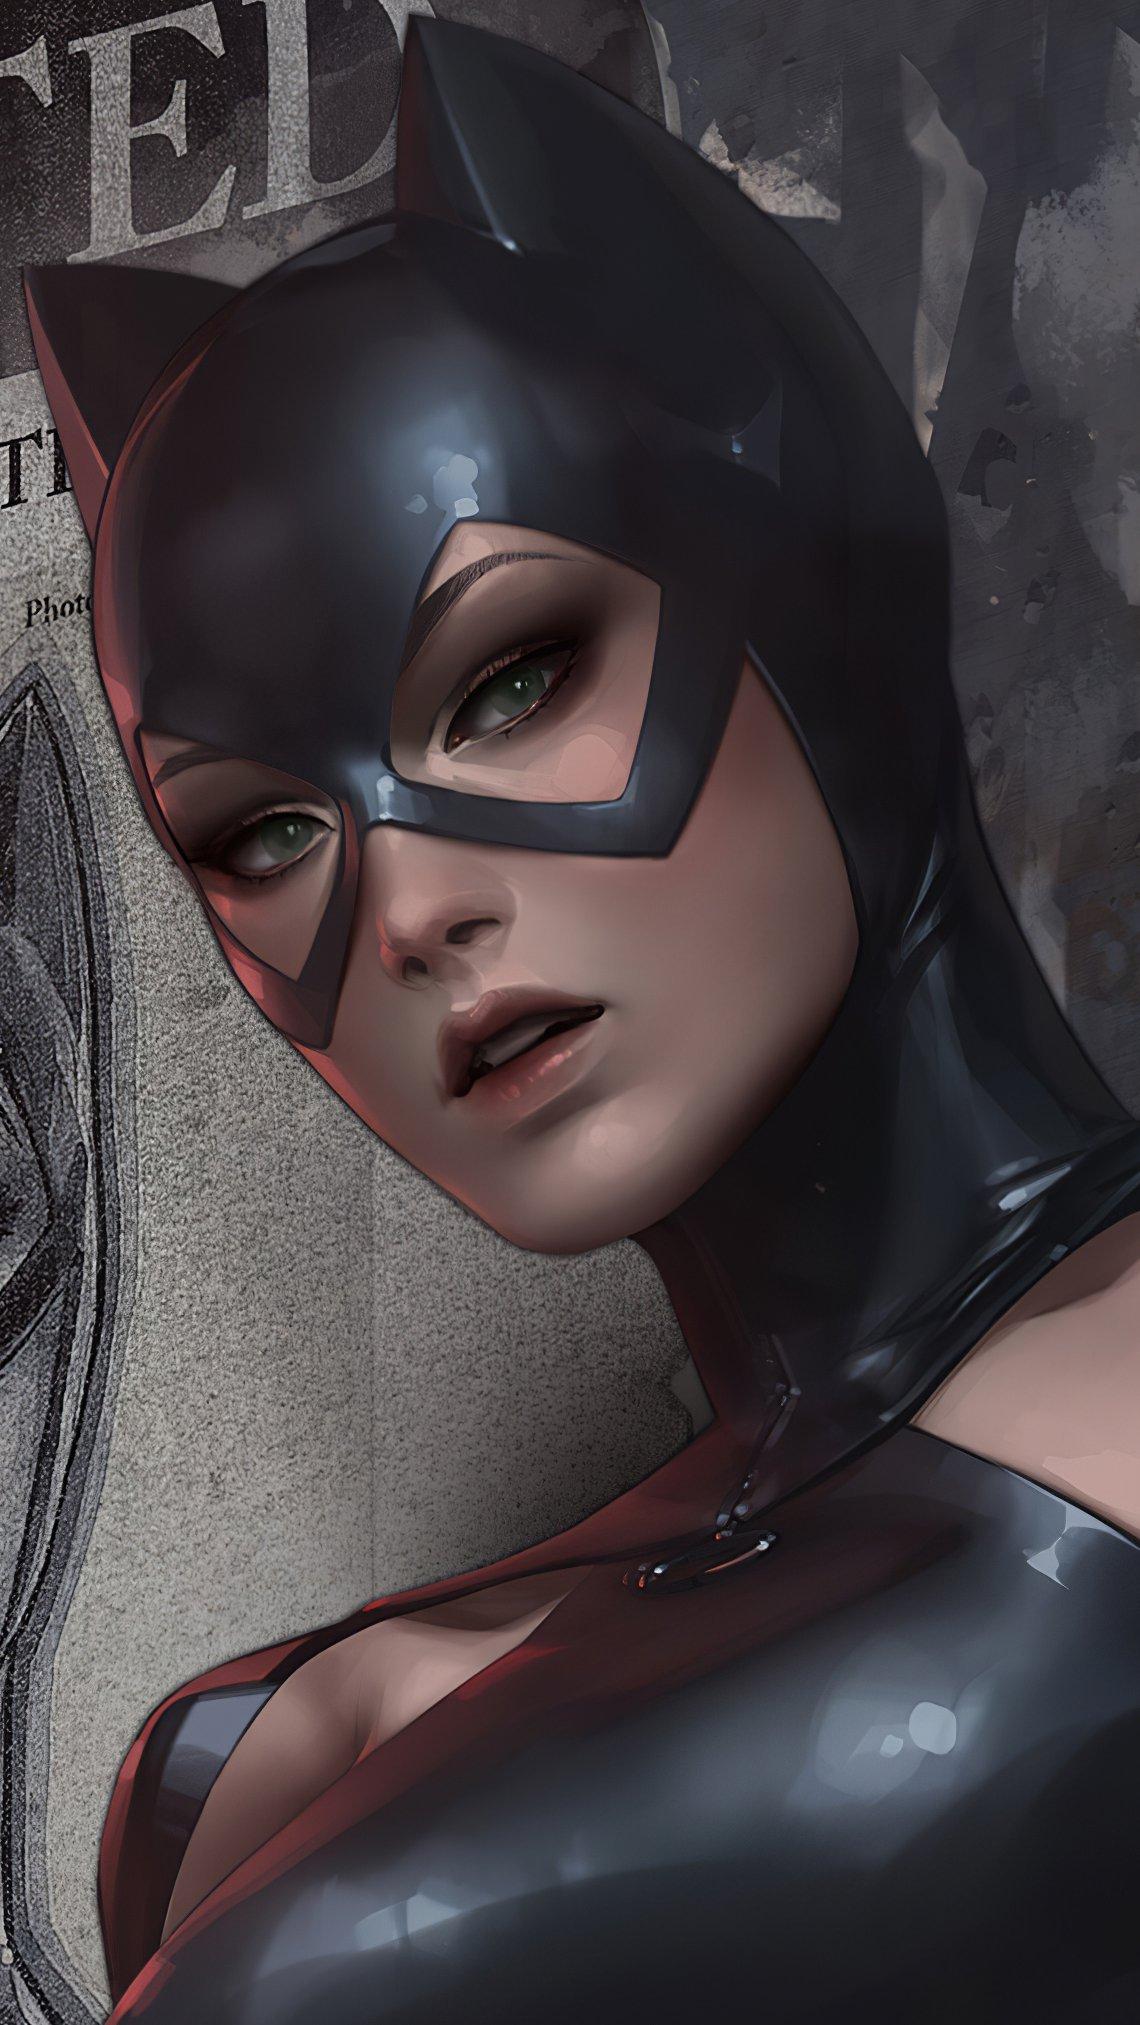 Fondos de pantalla Catwoman Fanart Vertical